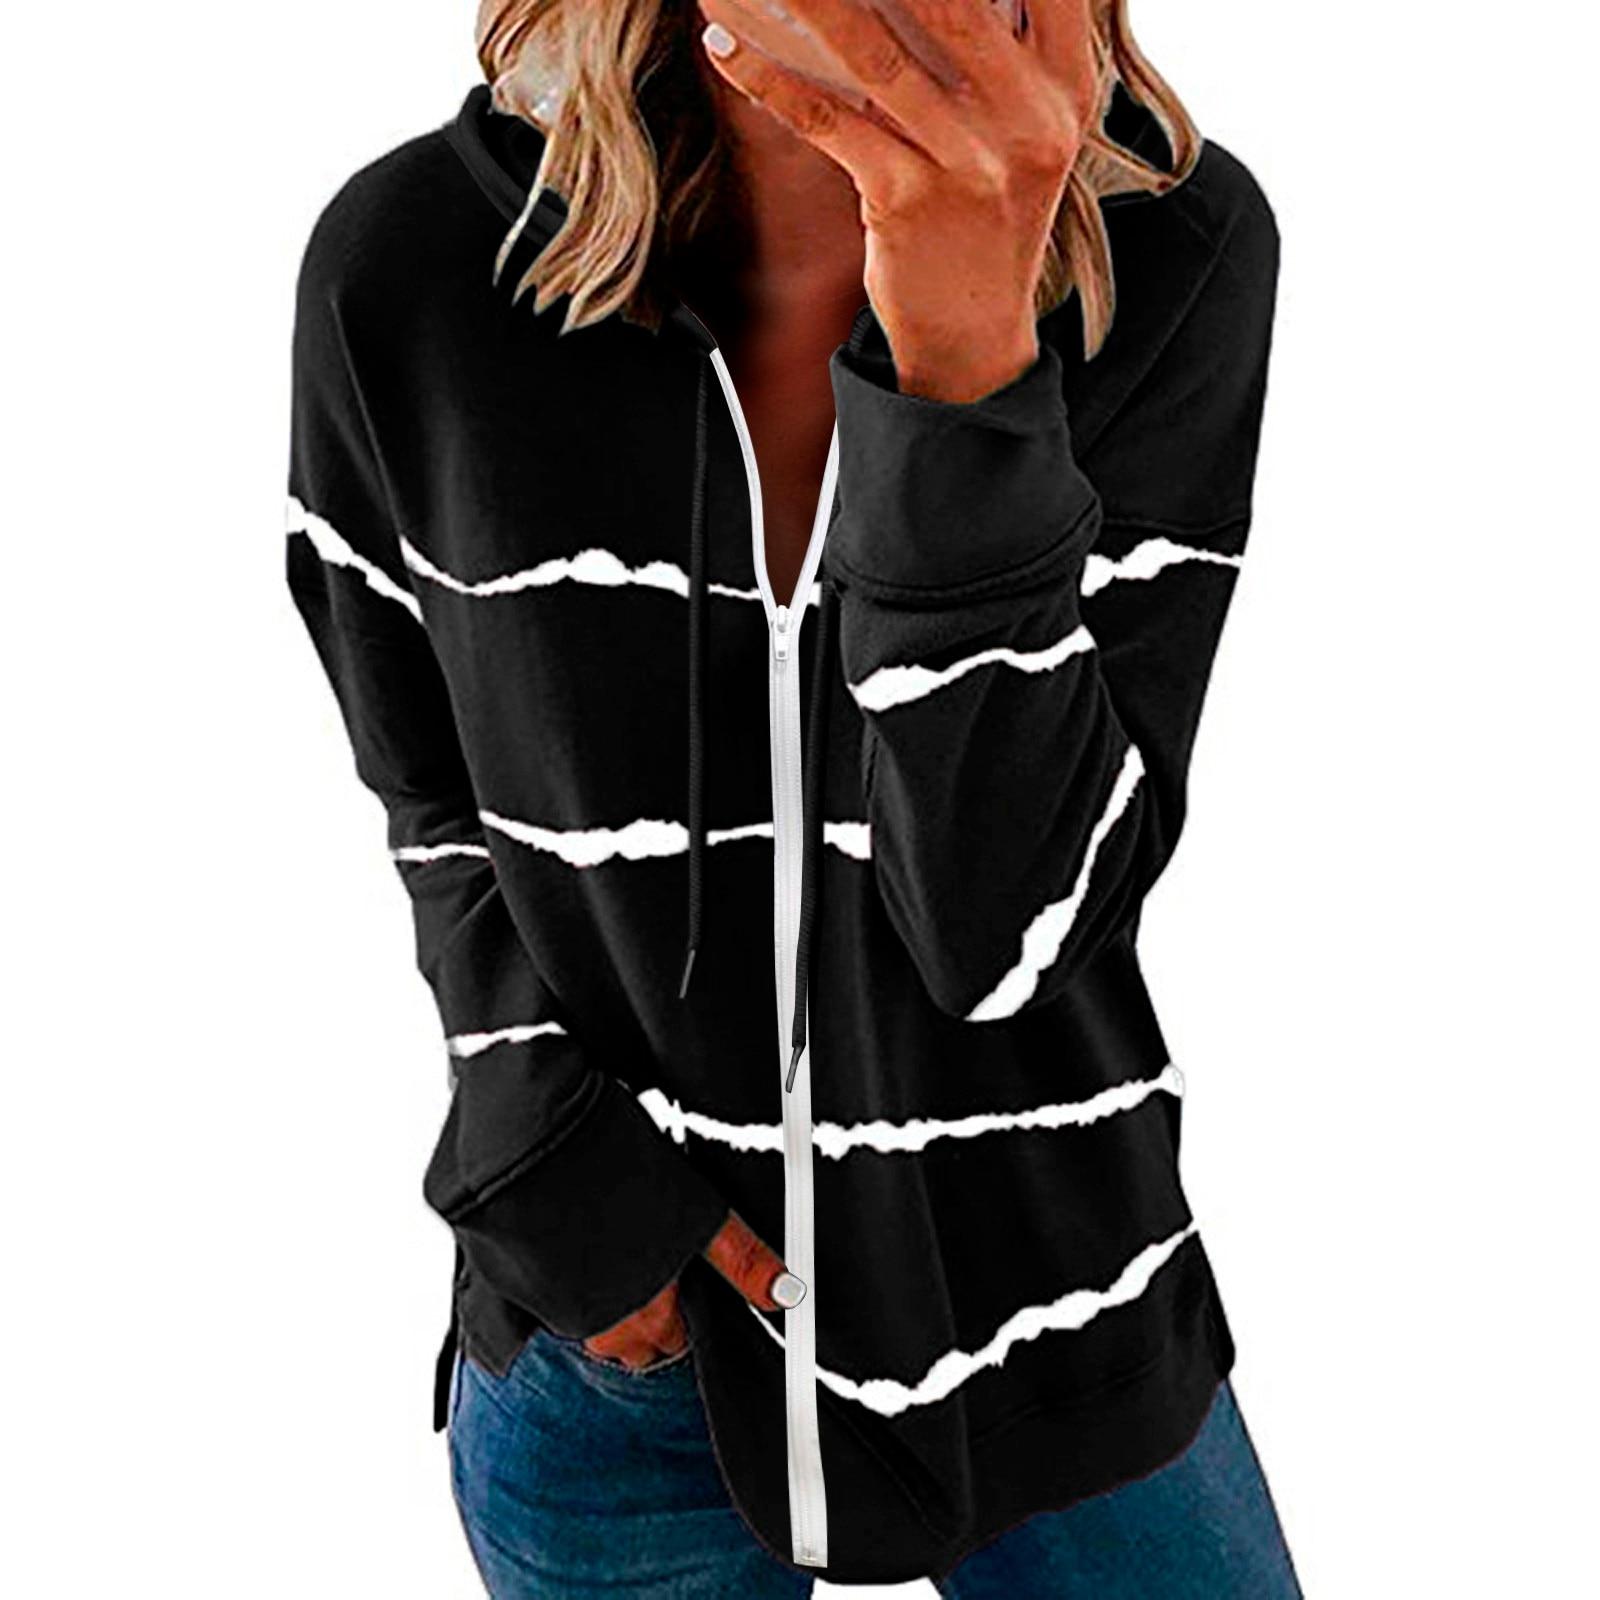 40#Womens Hoodie Striped Full Zipper Long Sleeve Lightweight Sweatshirts Spring Elegant Pullover Tee Tops толстовка женская 12